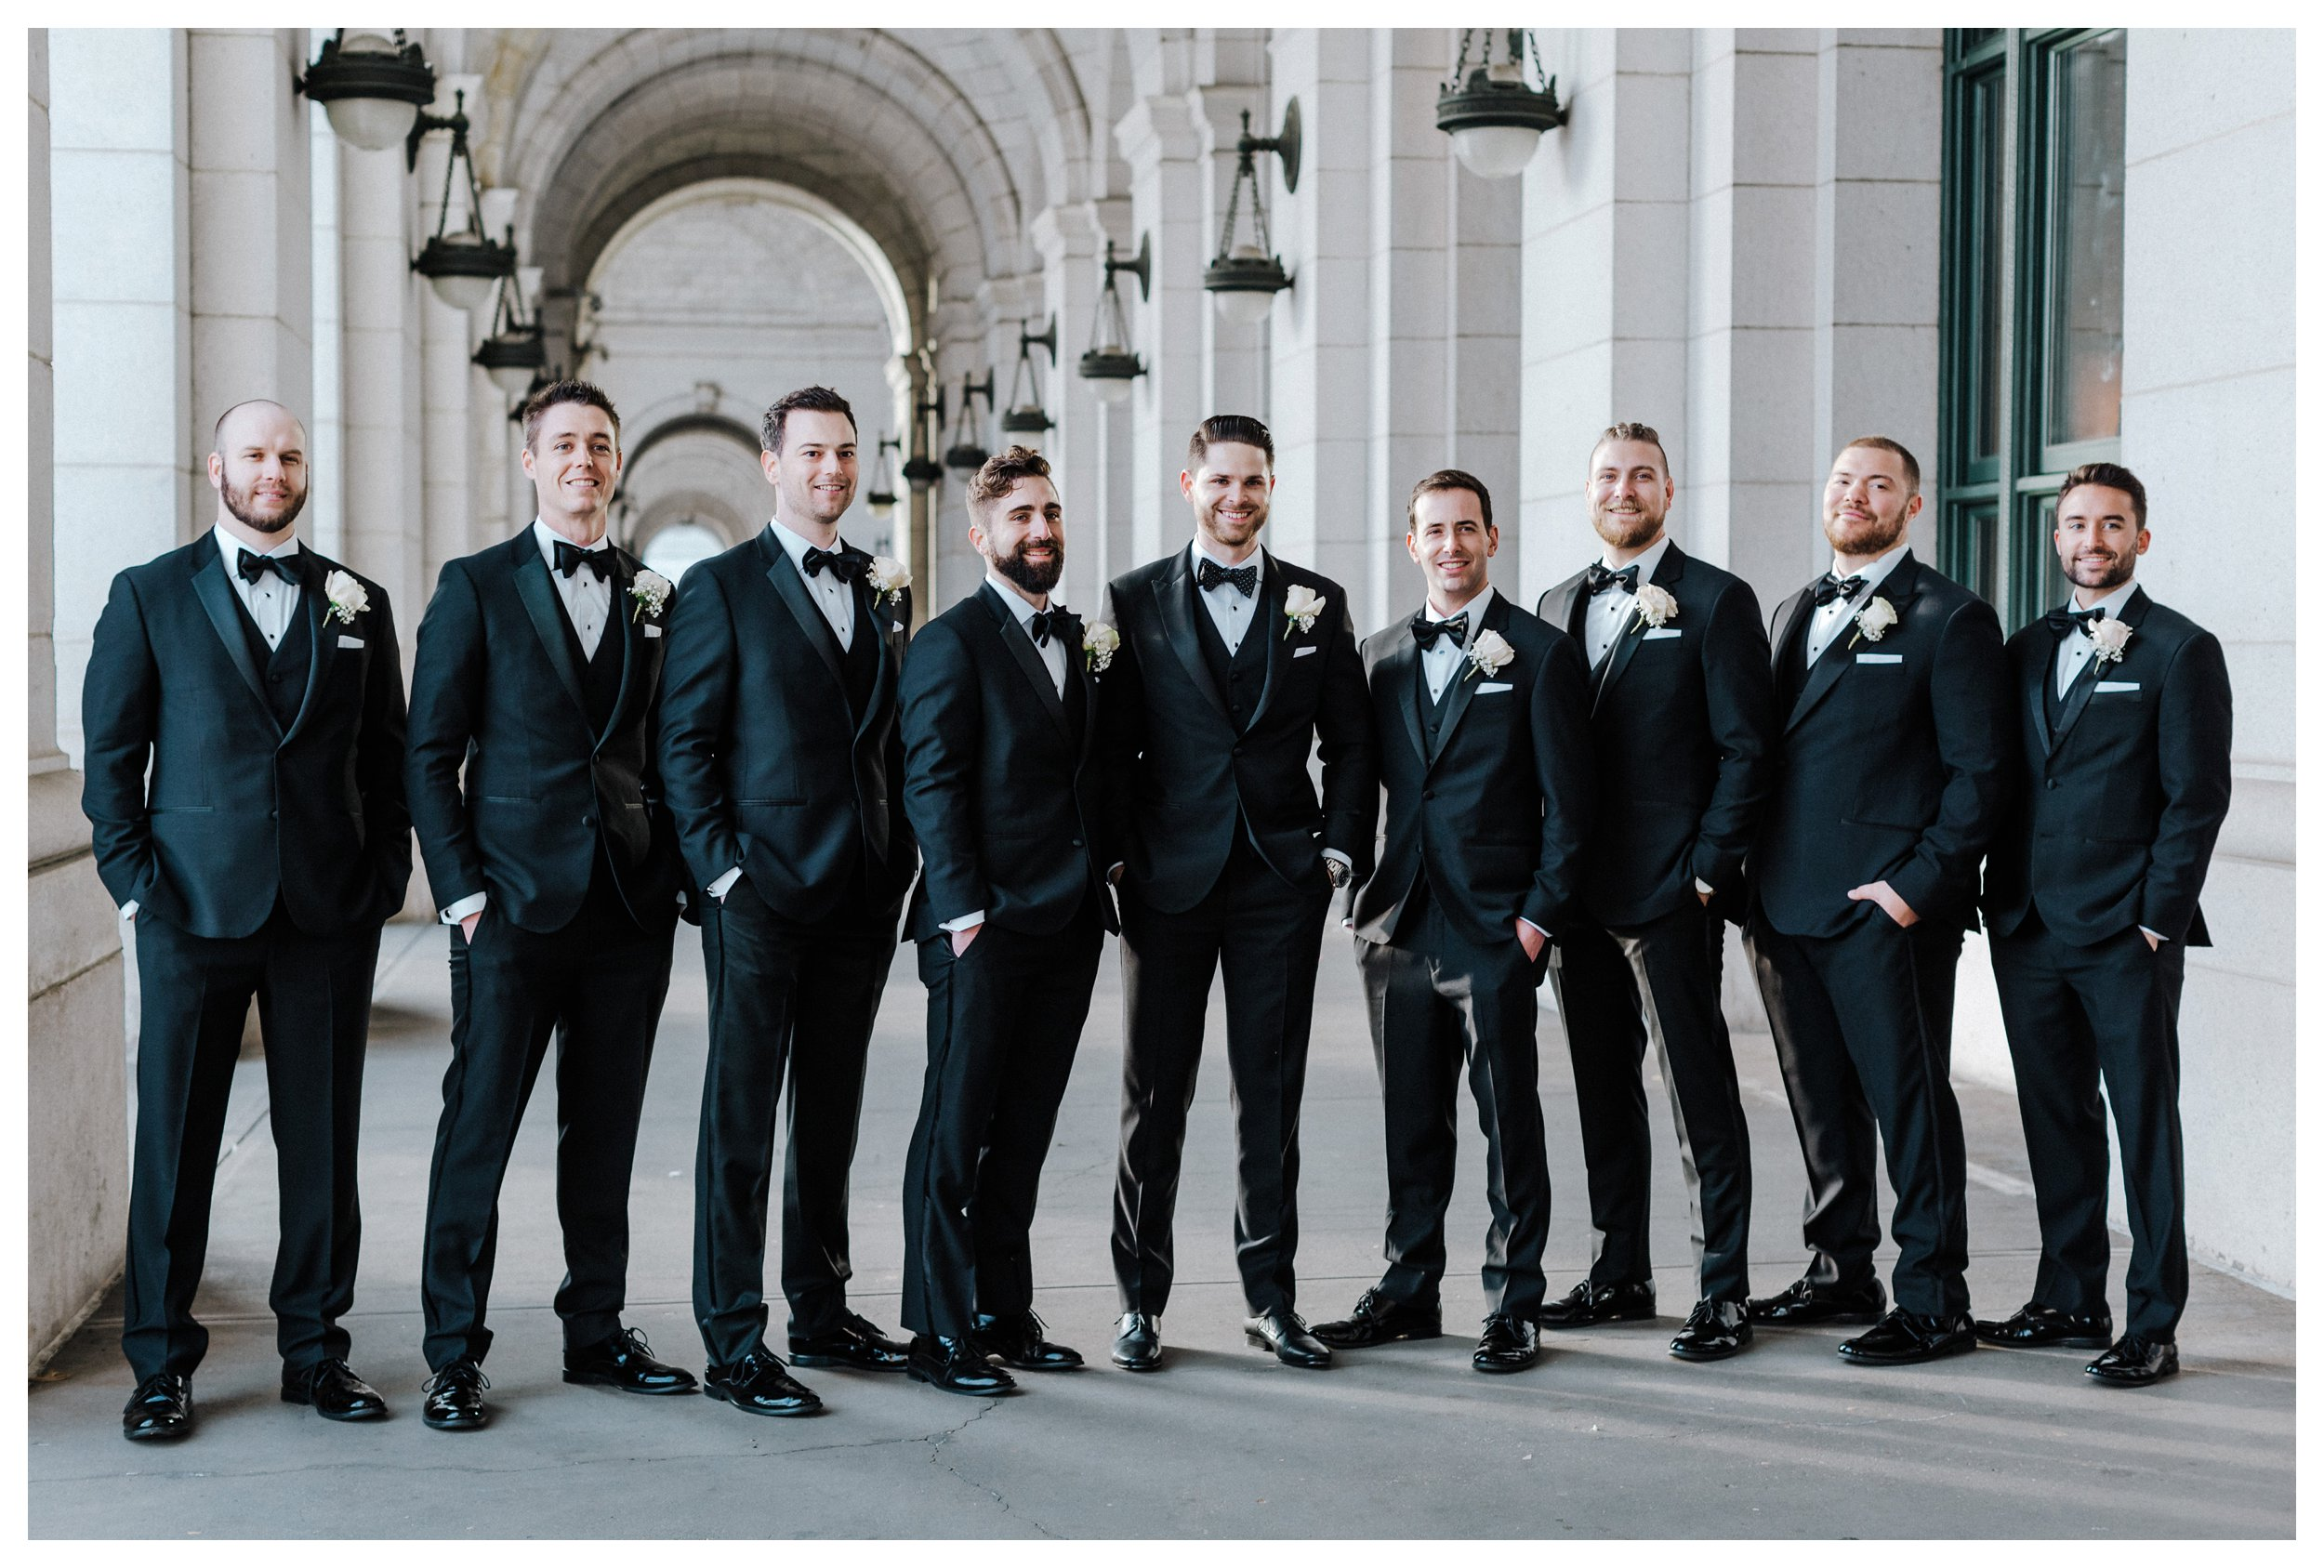 washington-dc-wedding-photographer-23.JPG